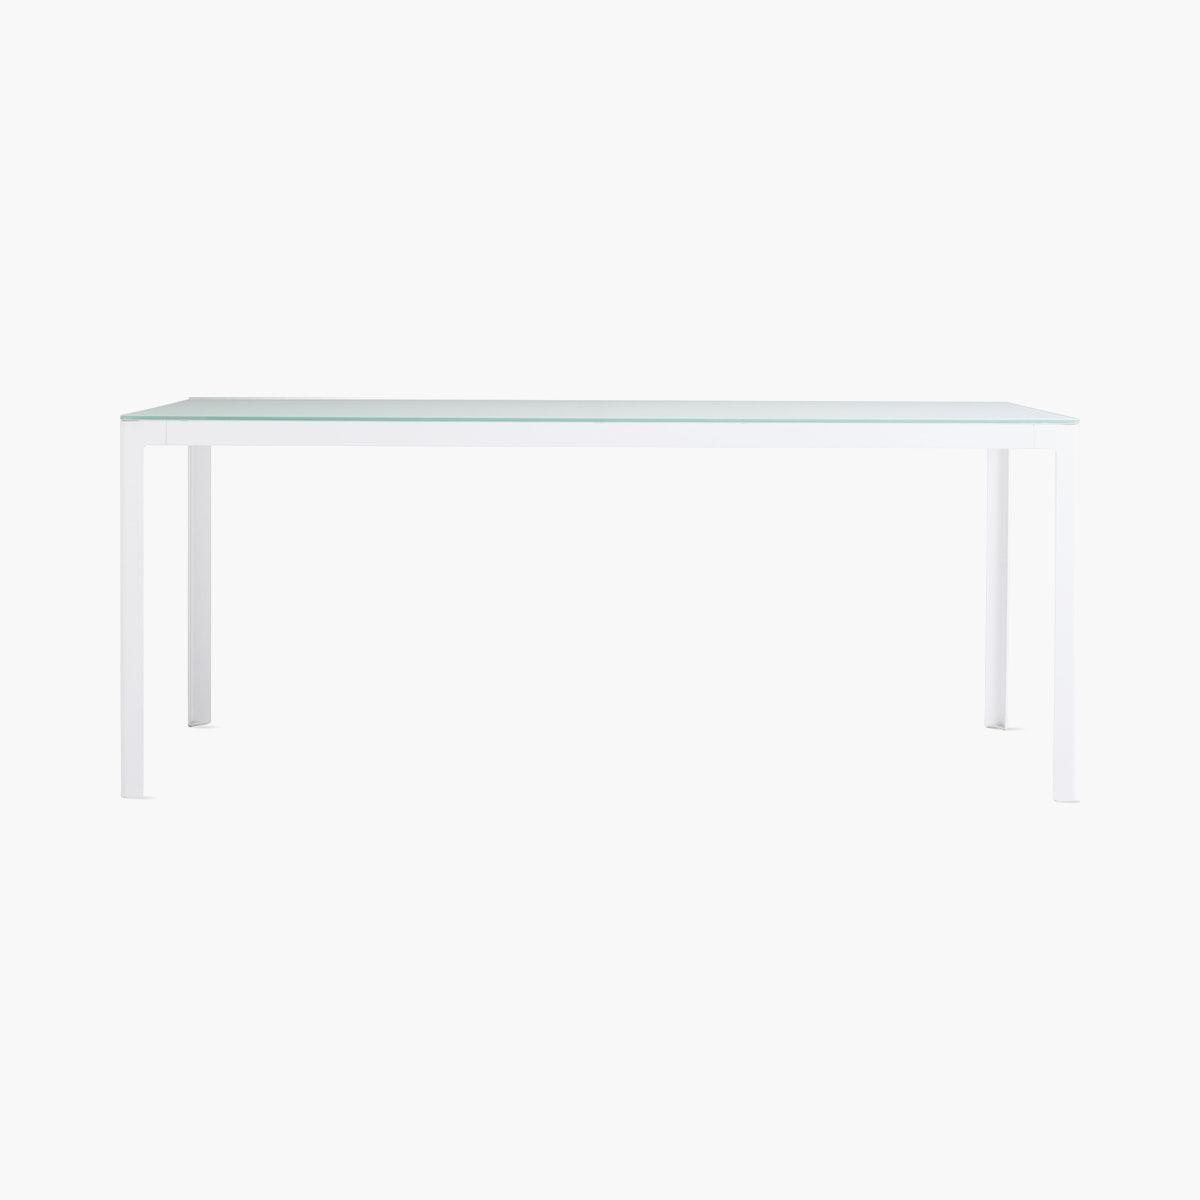 Min Table